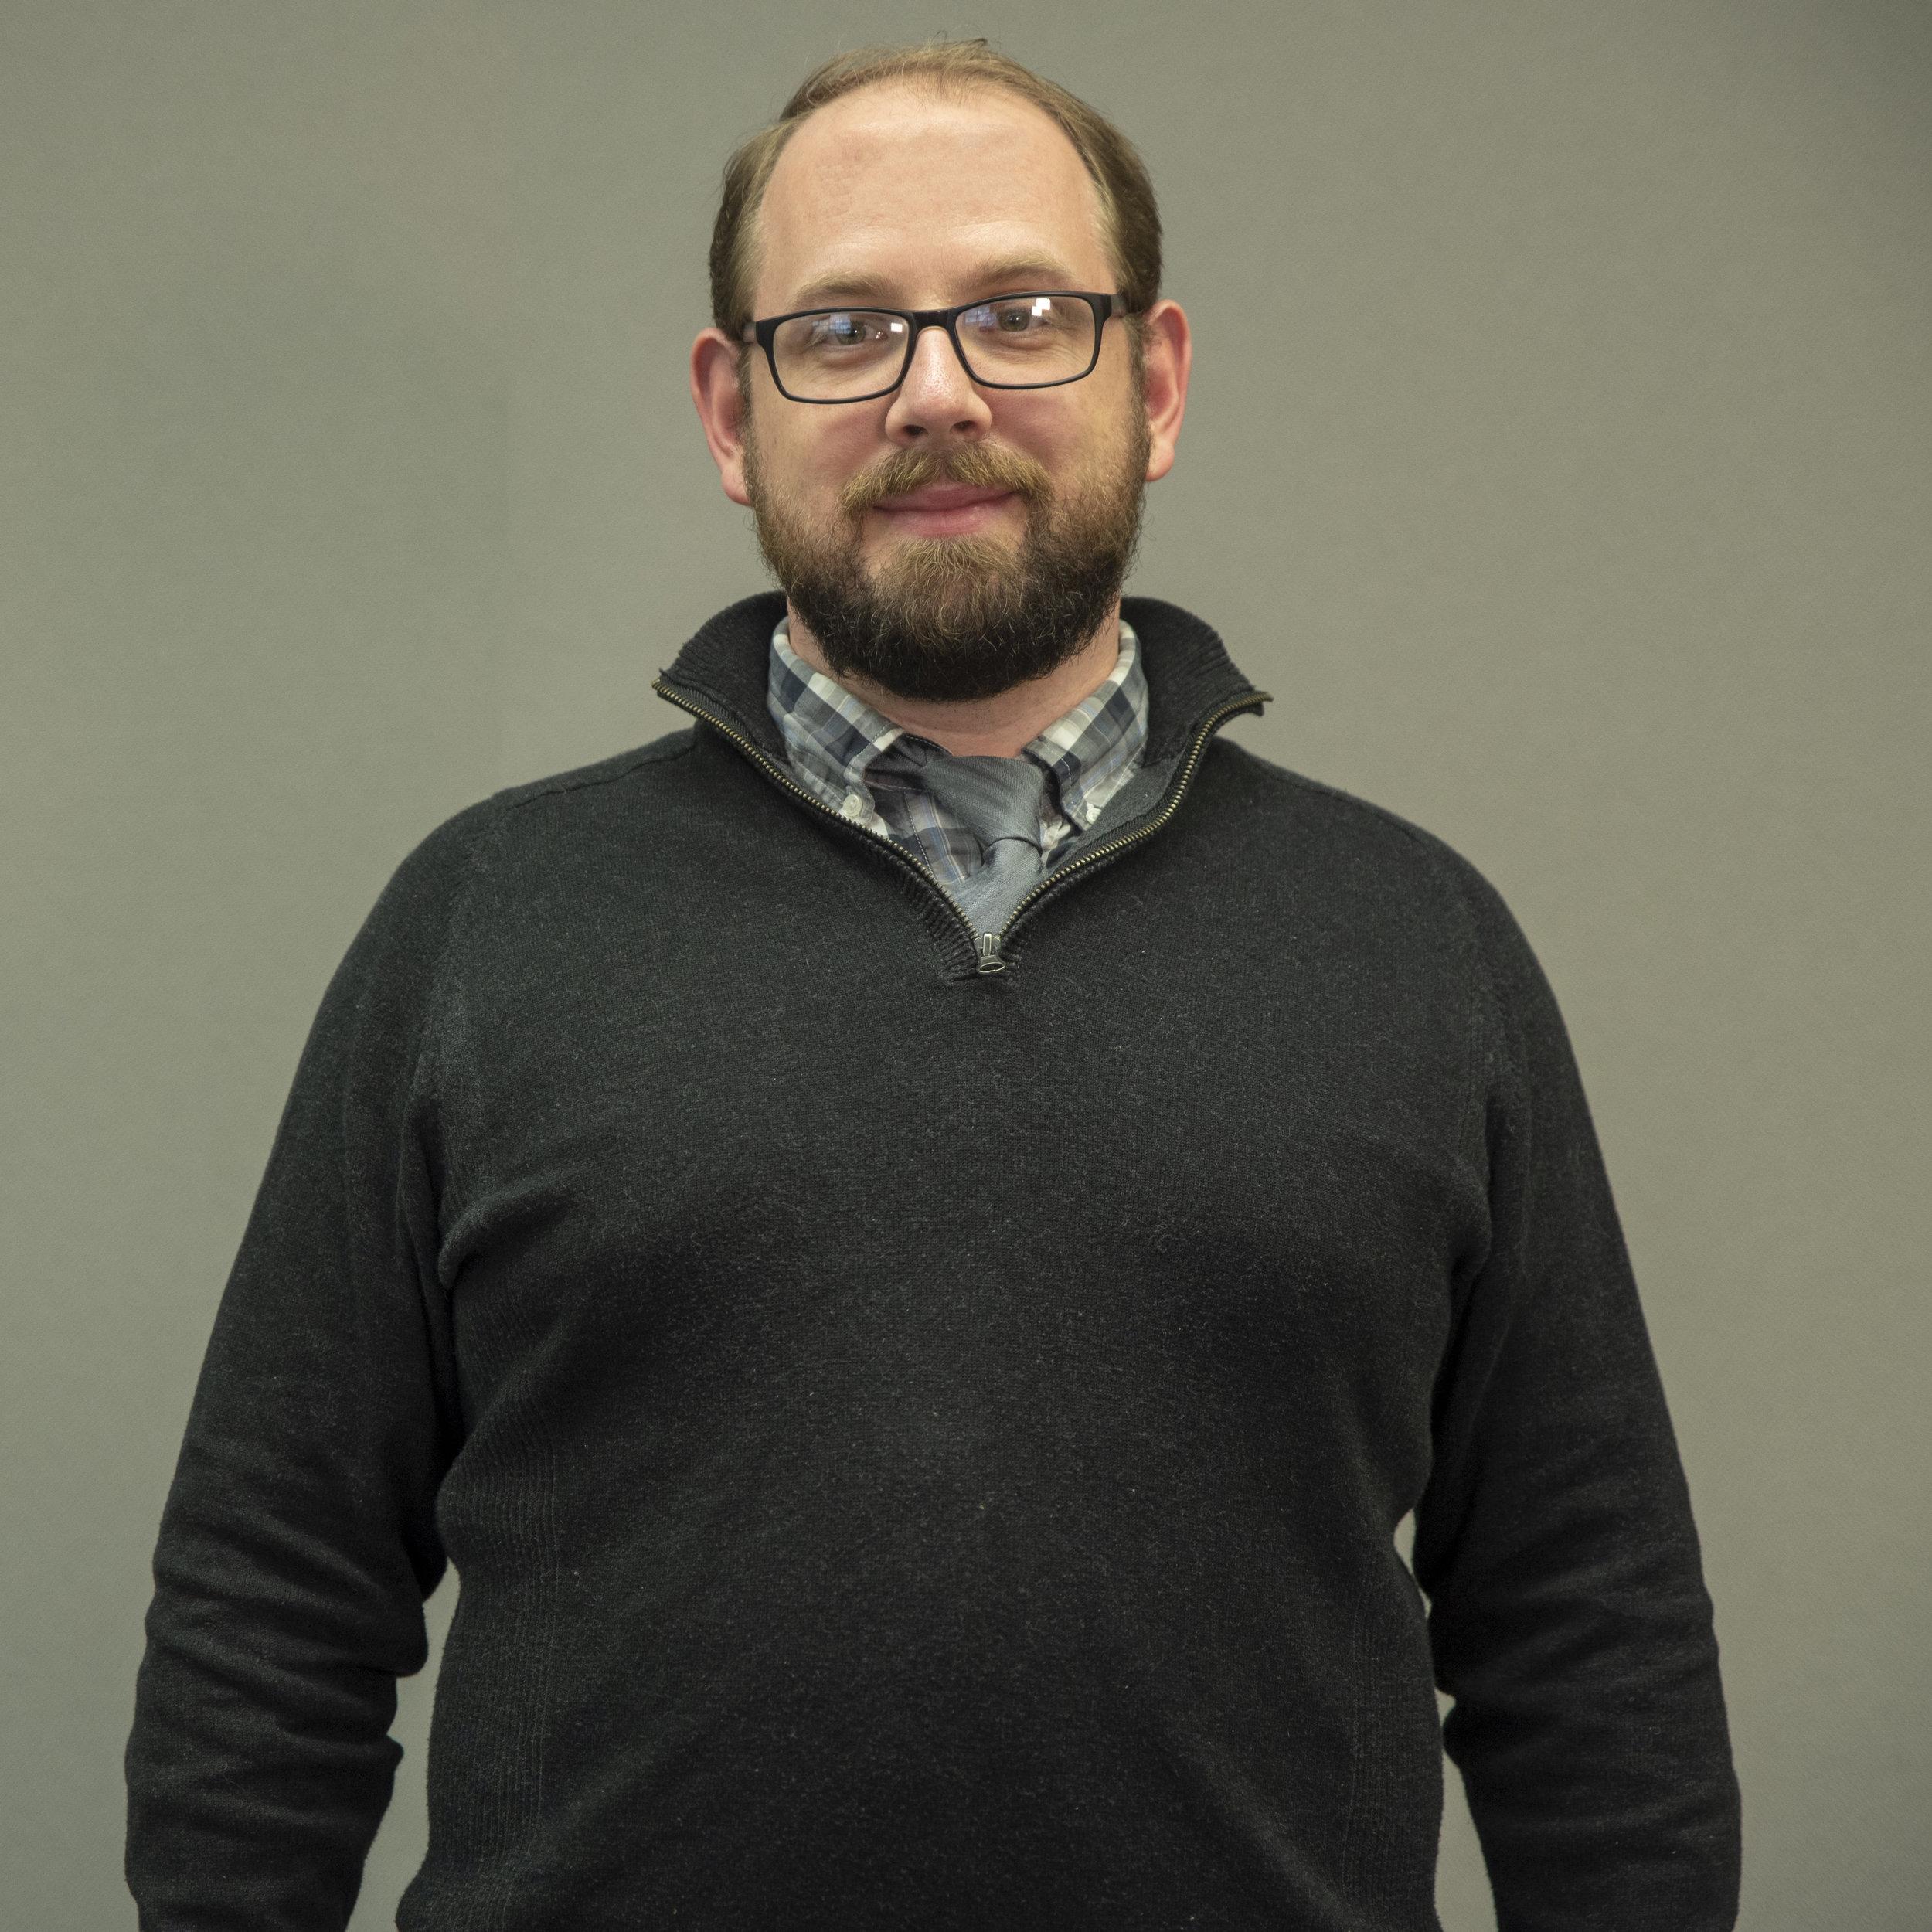 Stephen Proctor - Social Studies Instructorsproctor@chayvs.org